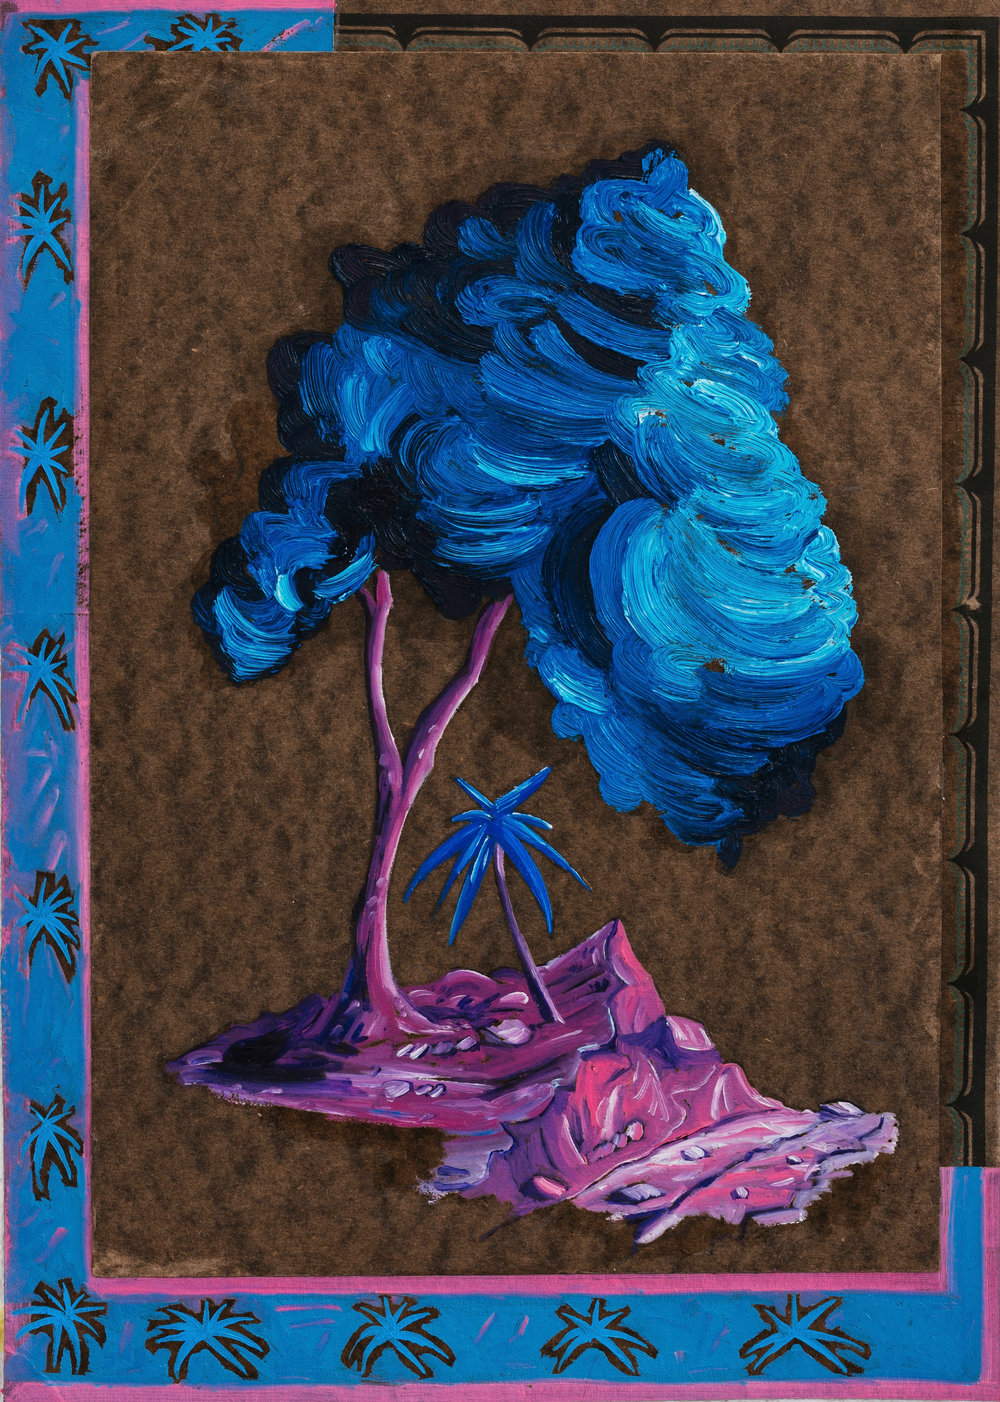 Abb.: David Eager Maher, Blue Tree, 2018